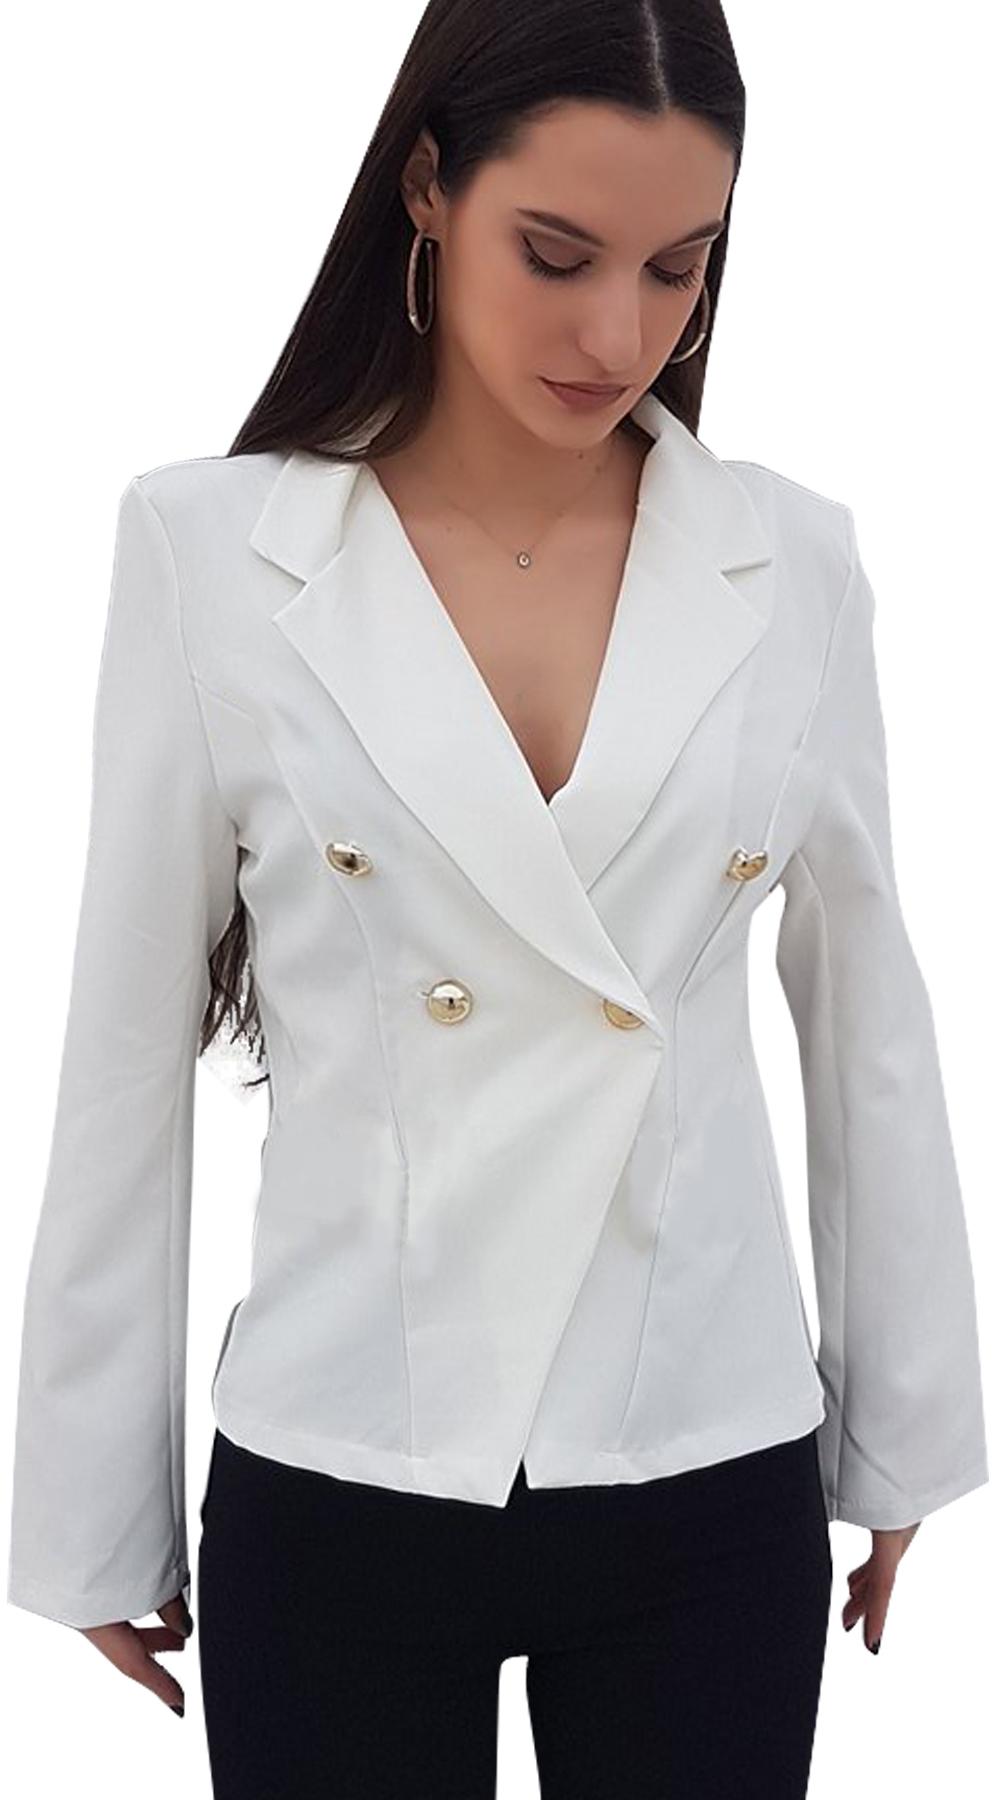 29866c6917 Γυναικείο κοντό blazer office look σταυρωτό